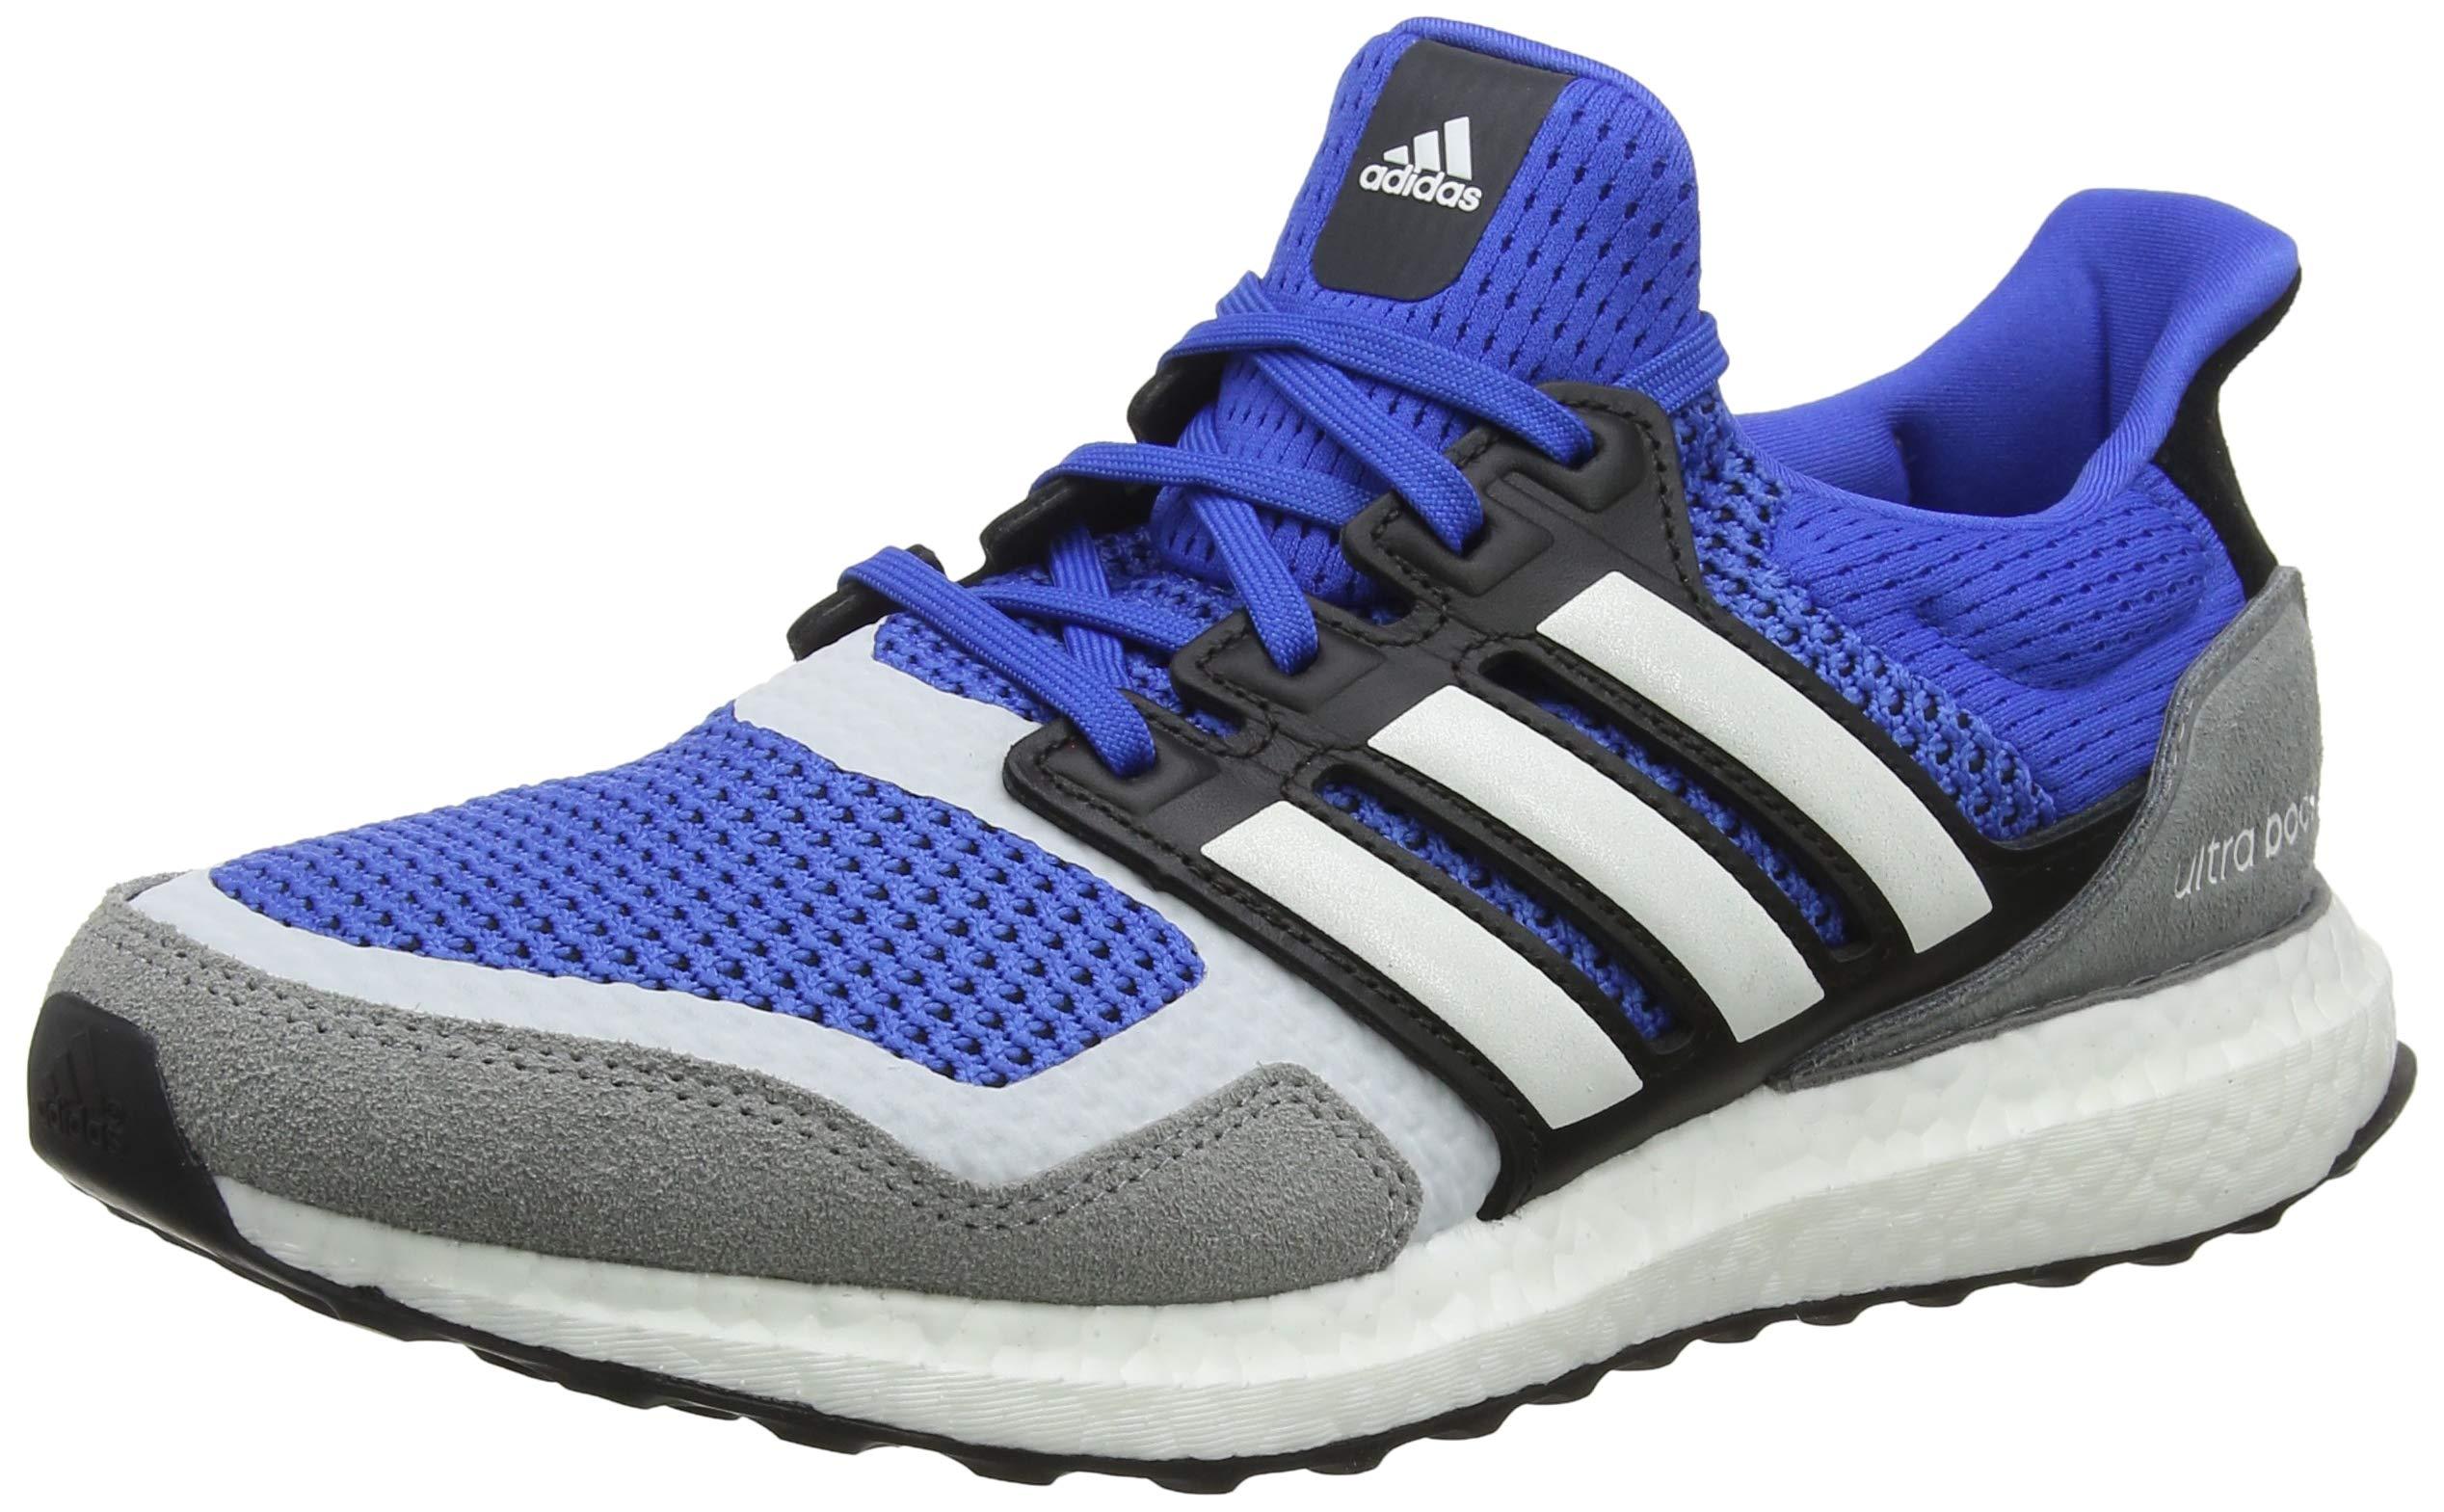 adidas Ultraboost S&l, Scarpe da Running Uomo 1 spesavip